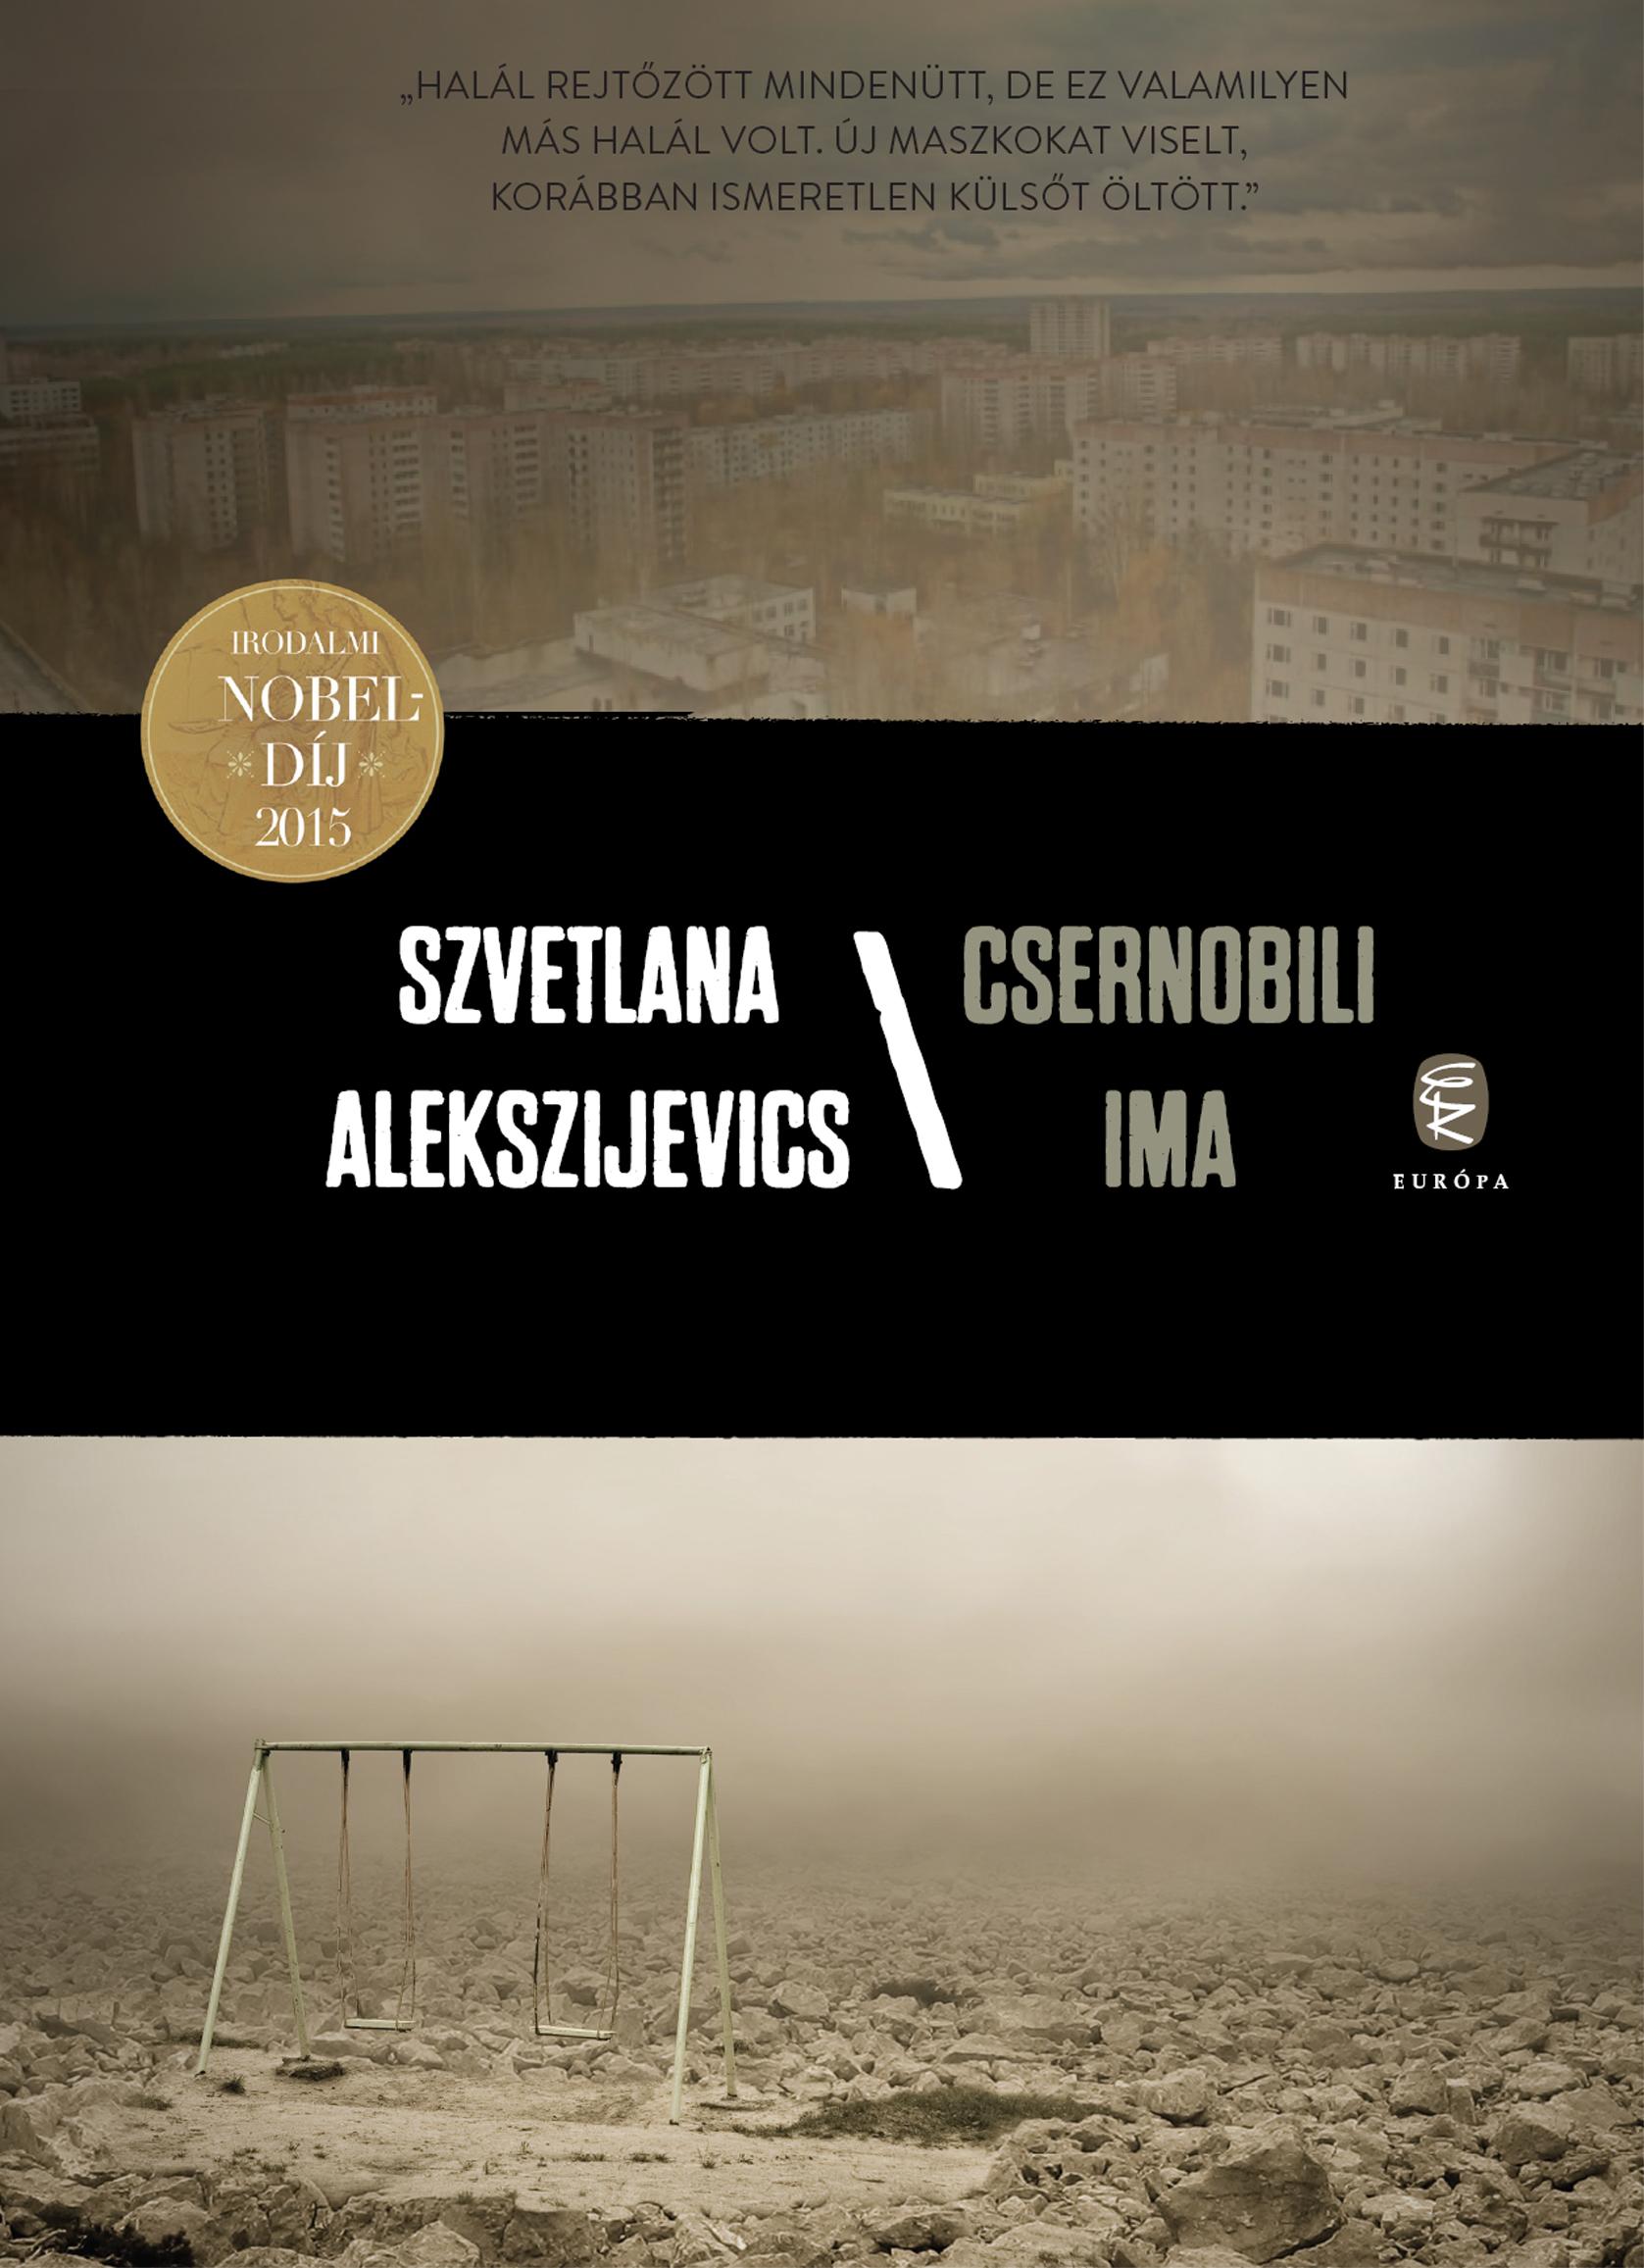 Alekszijevics_Csernobili_ima